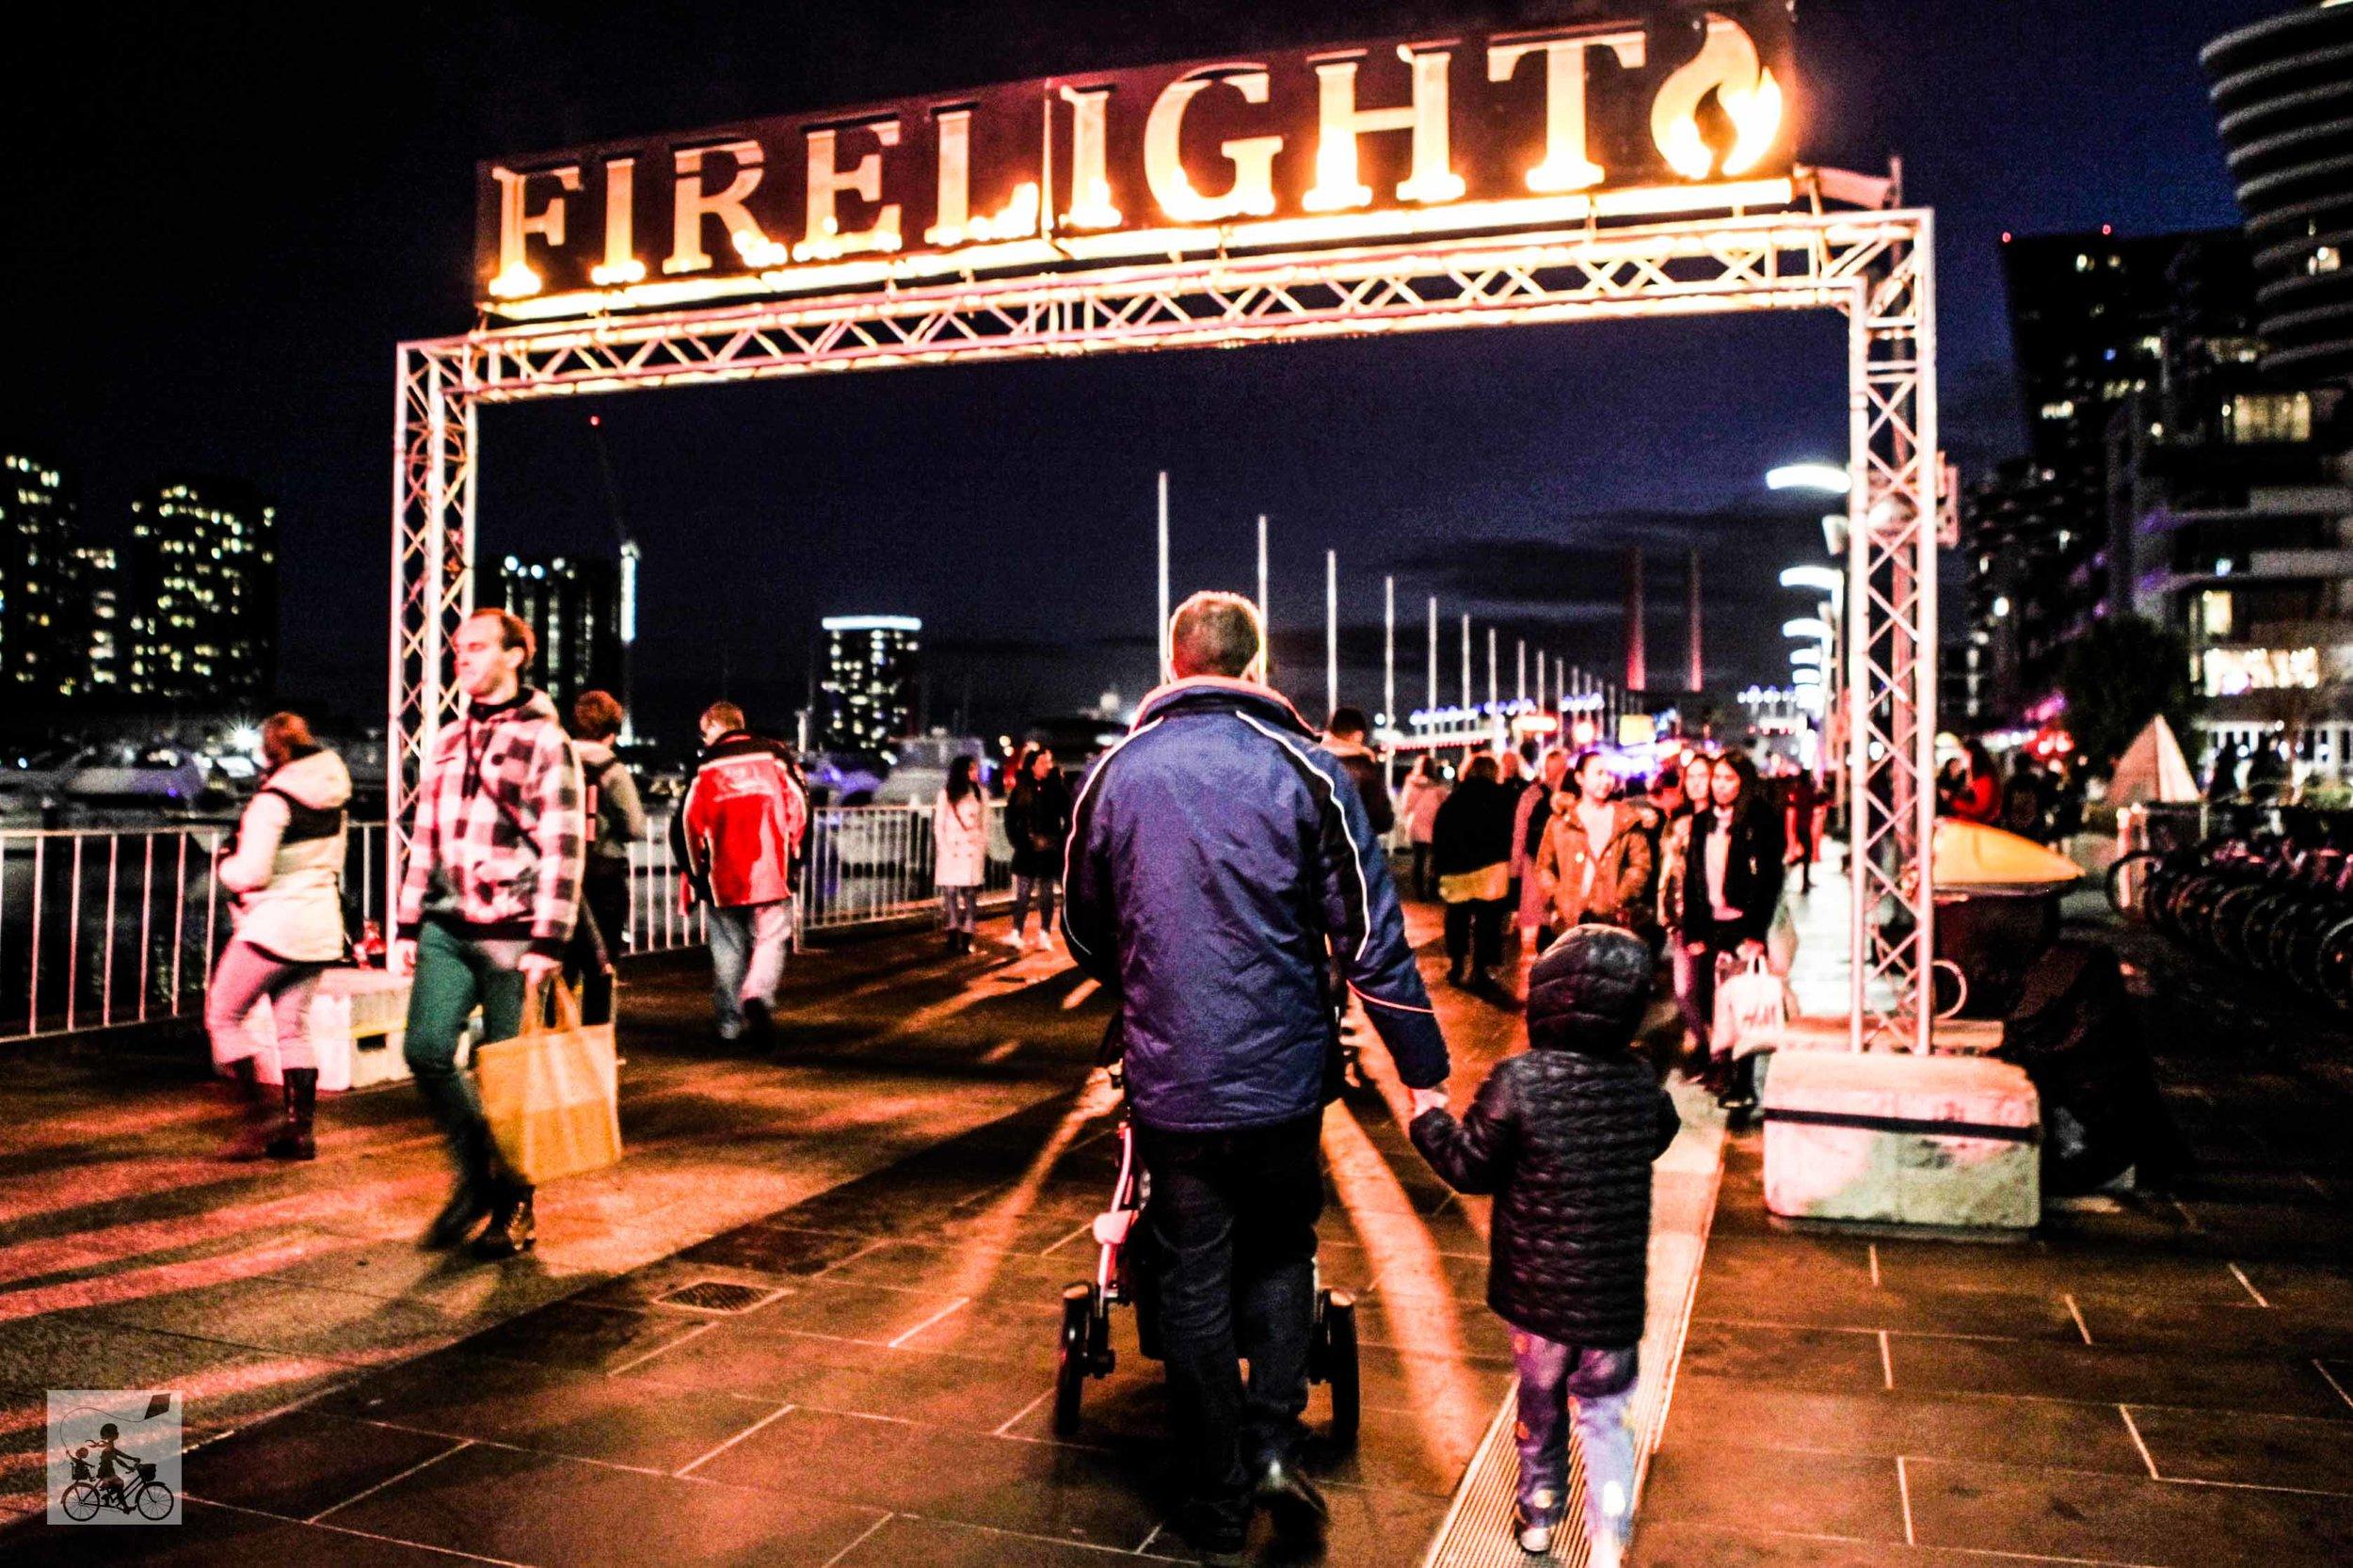 Firelight Festival - Mamma Knows Melbourne (1 of 11).jpg